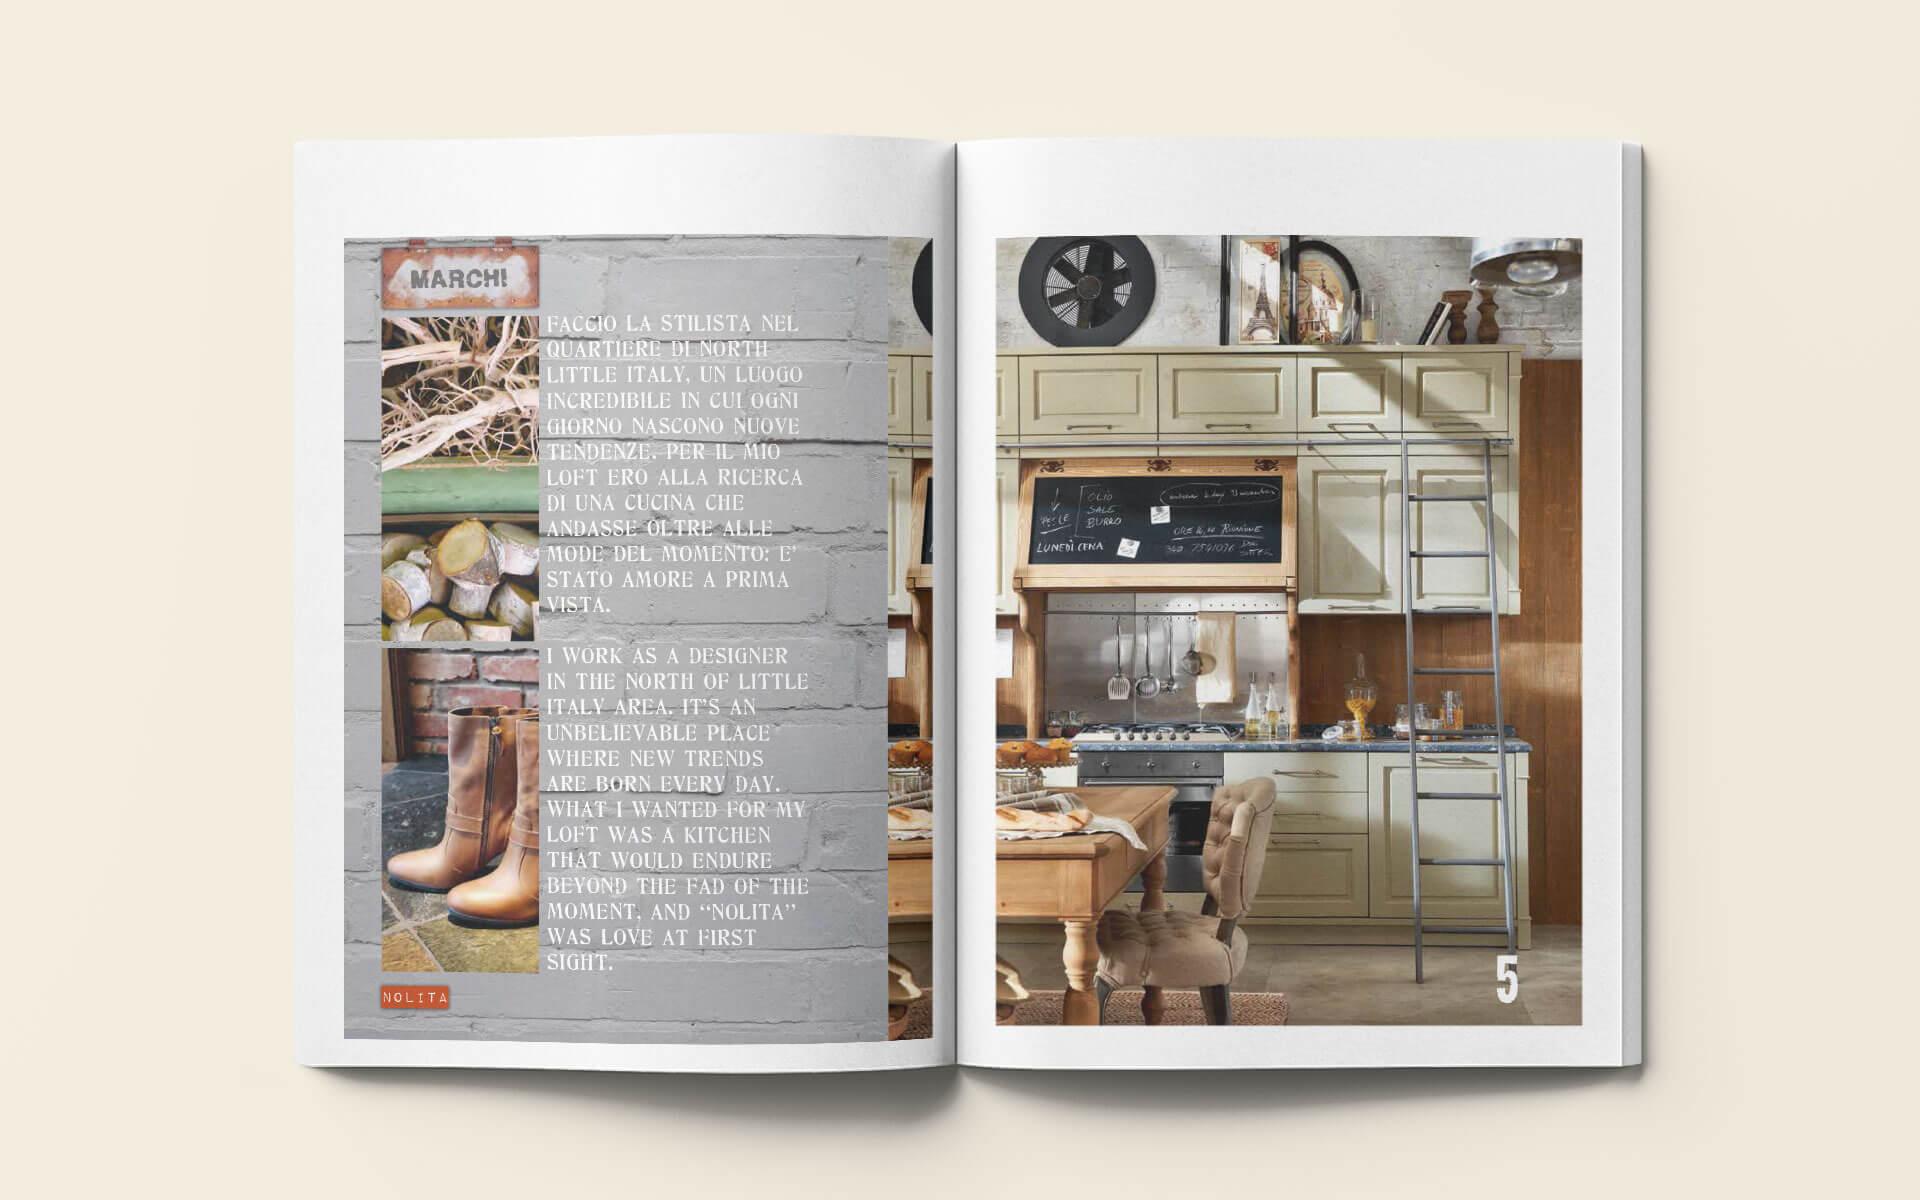 Catalogo Nolita - Marchi Cucine Made in Italy